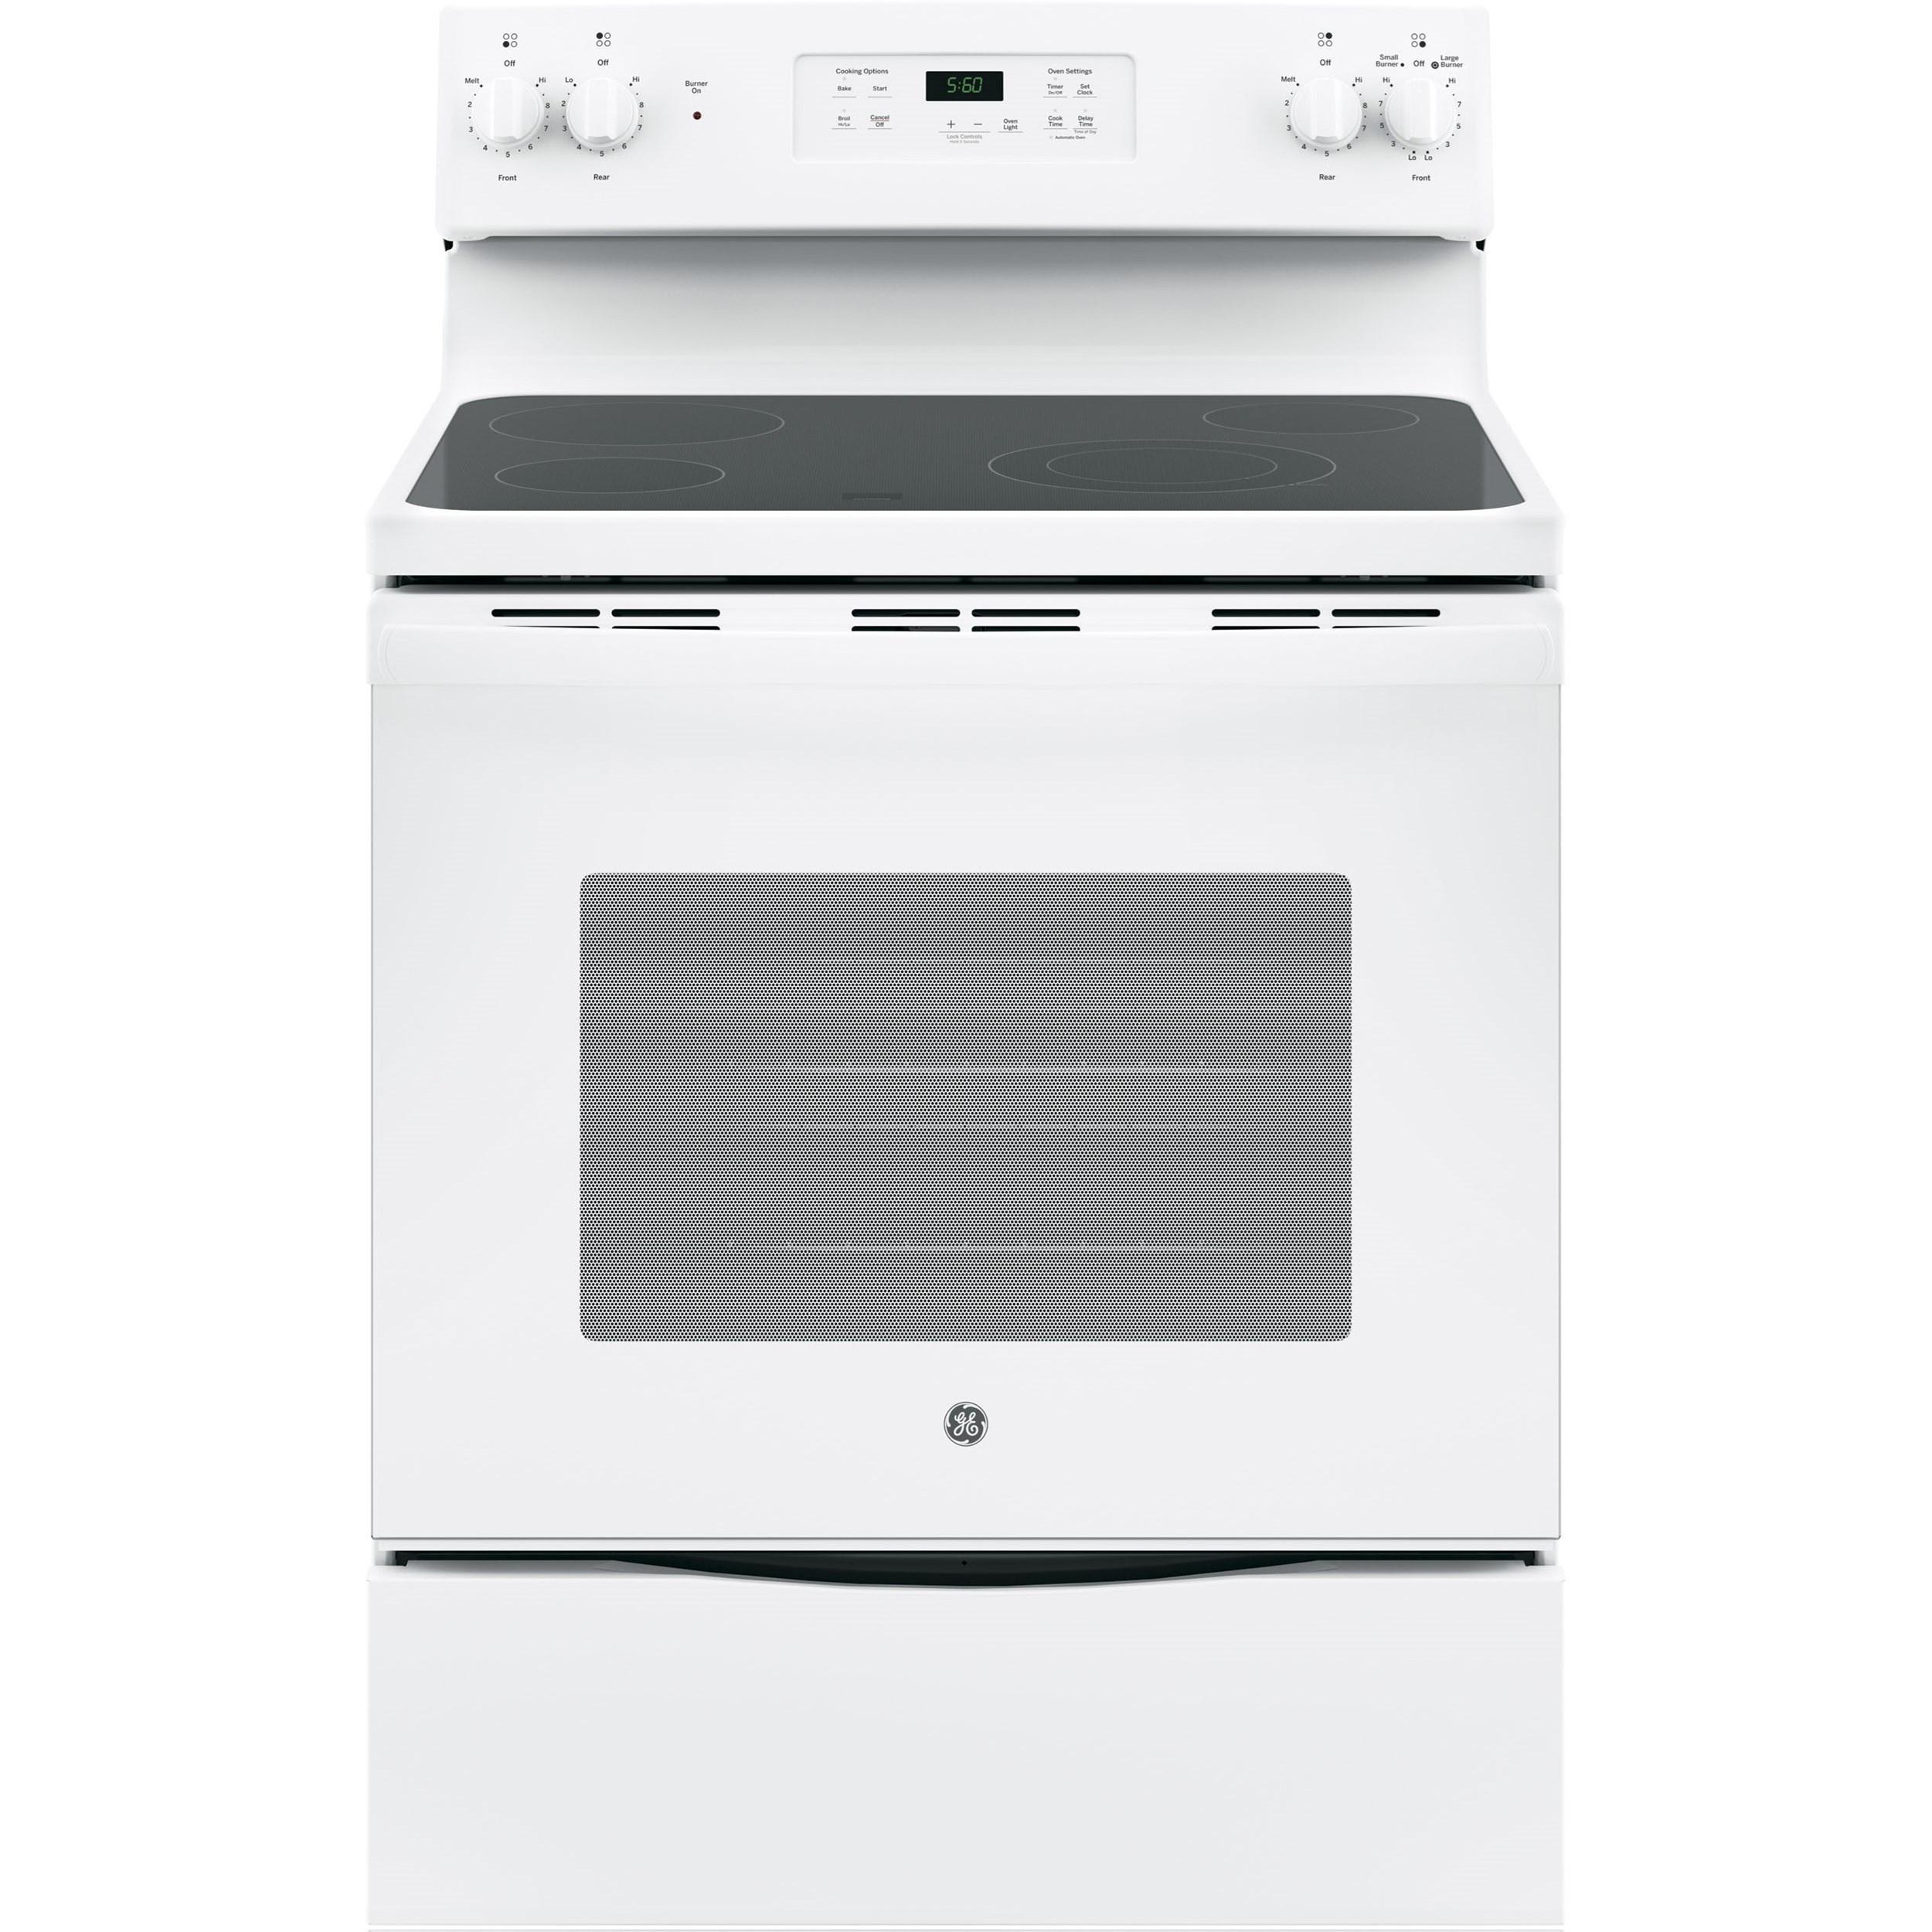 "GE Appliances GE Electric Ranges GE® 30"" Free-Standing Electric Range - Item Number: JBS60DKWW"